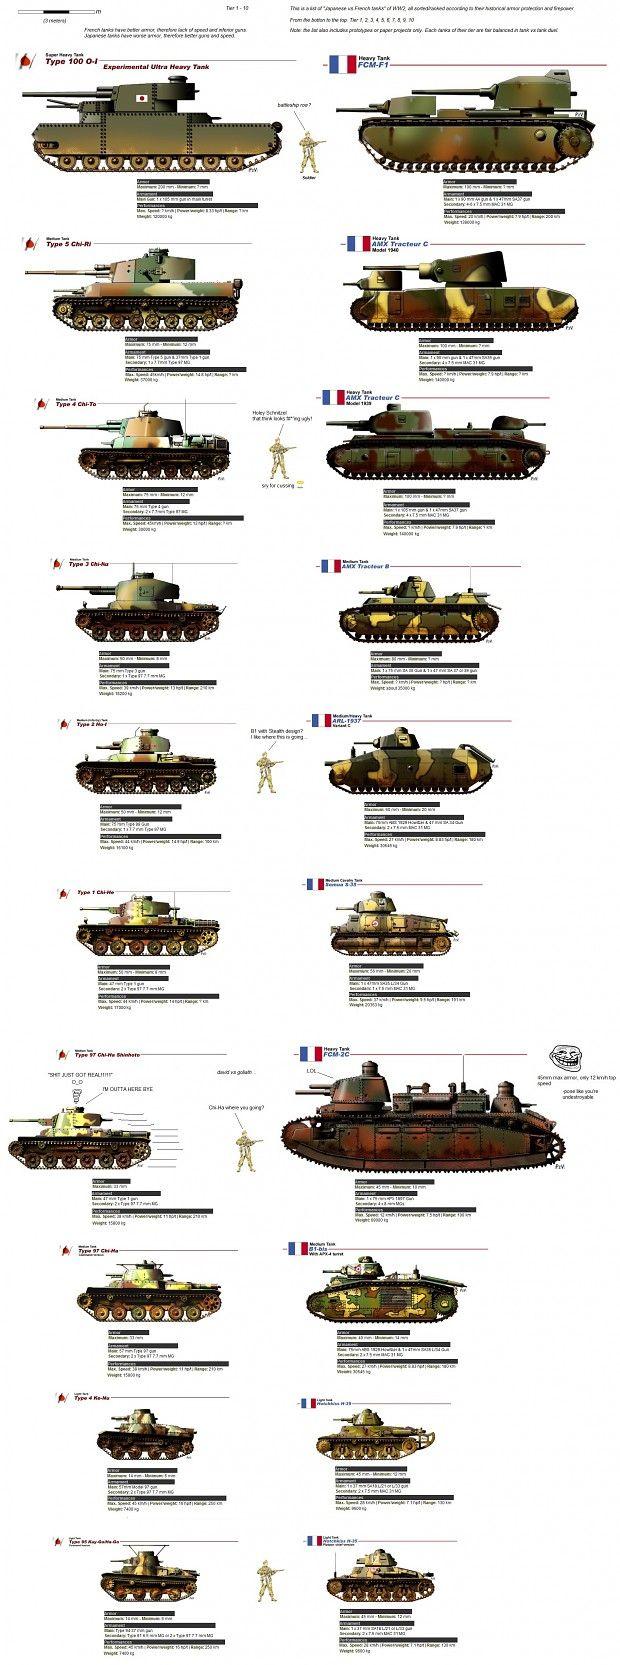 Tank tier/ranking list of Allies: France & Japan